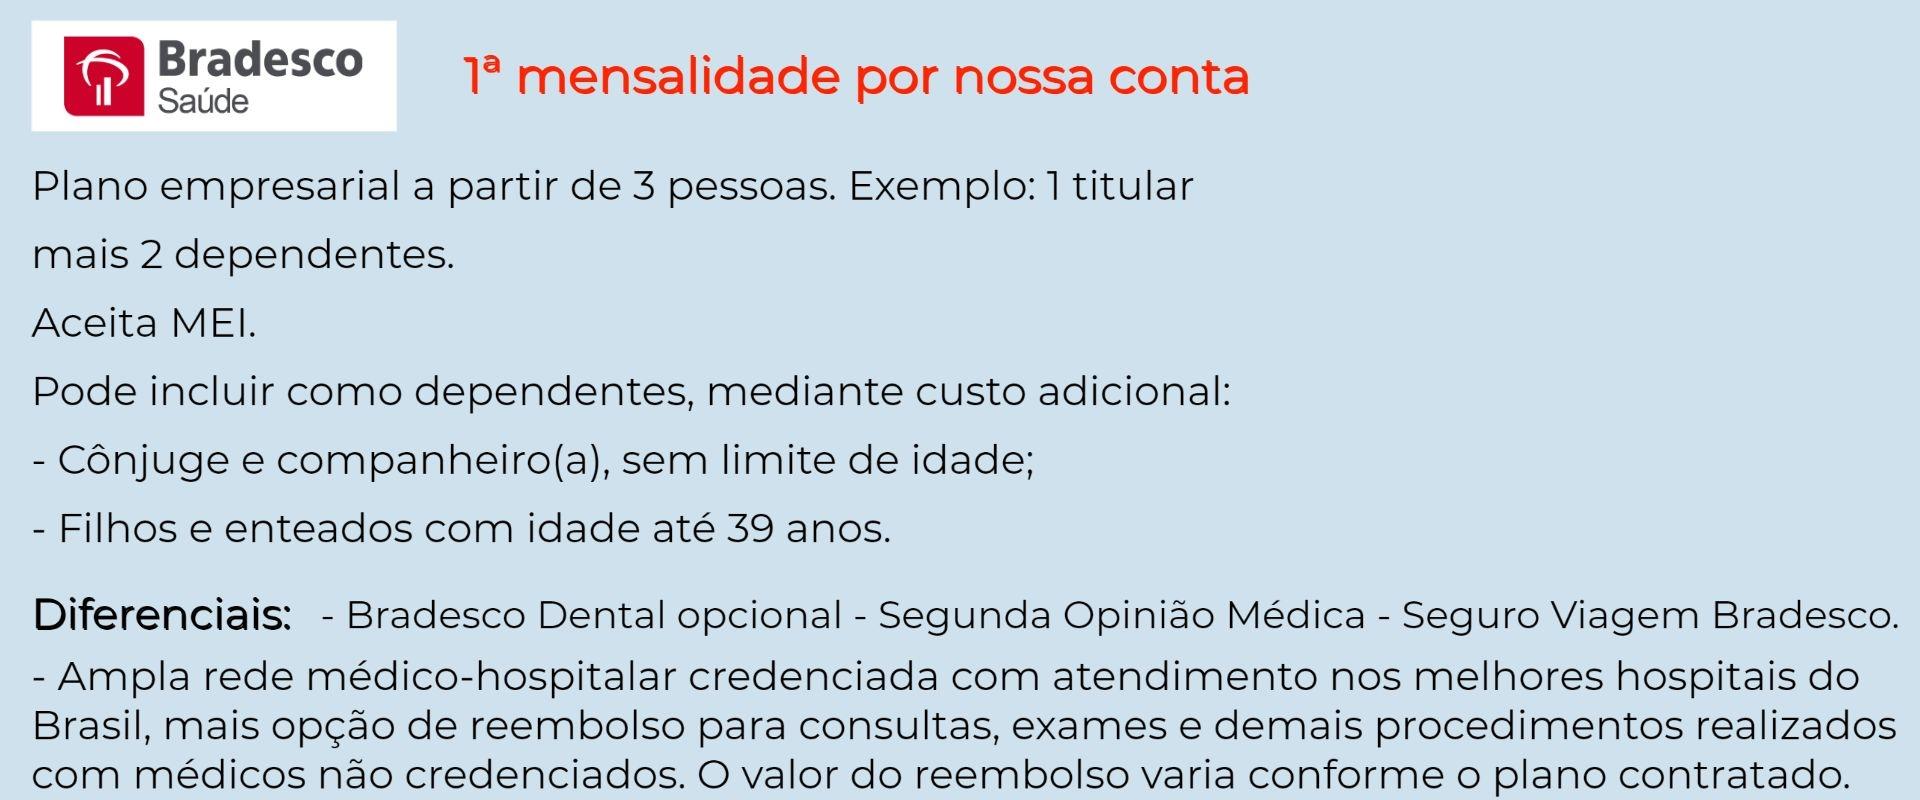 Bradesco Saúde Empresarial – Santo Antônio de Jesus